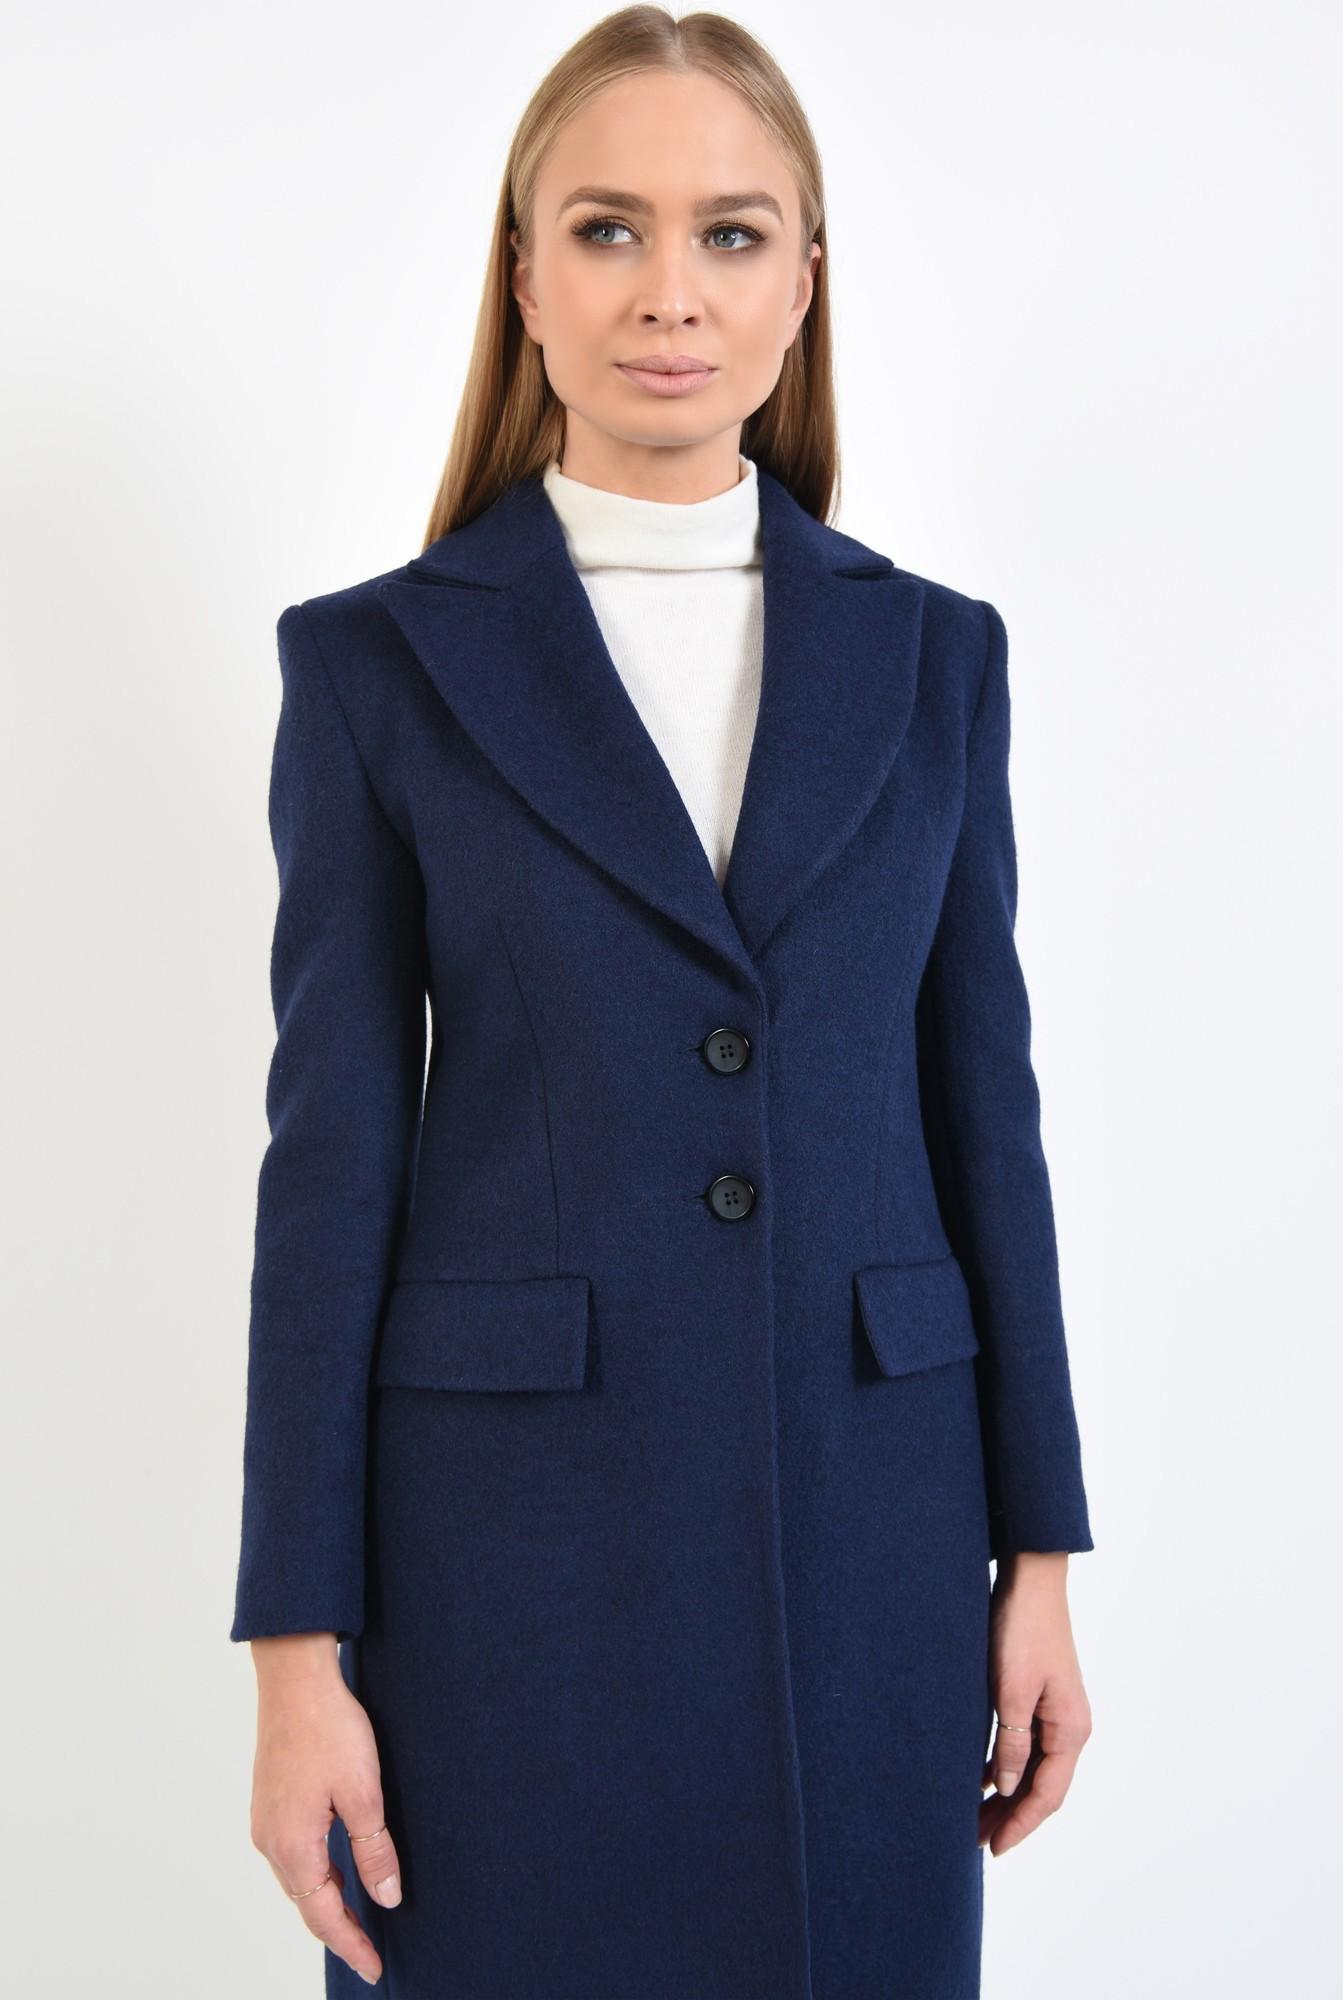 0 - 360 - paltoane online, bleumarin, croi lung, inchidere cu butoniera